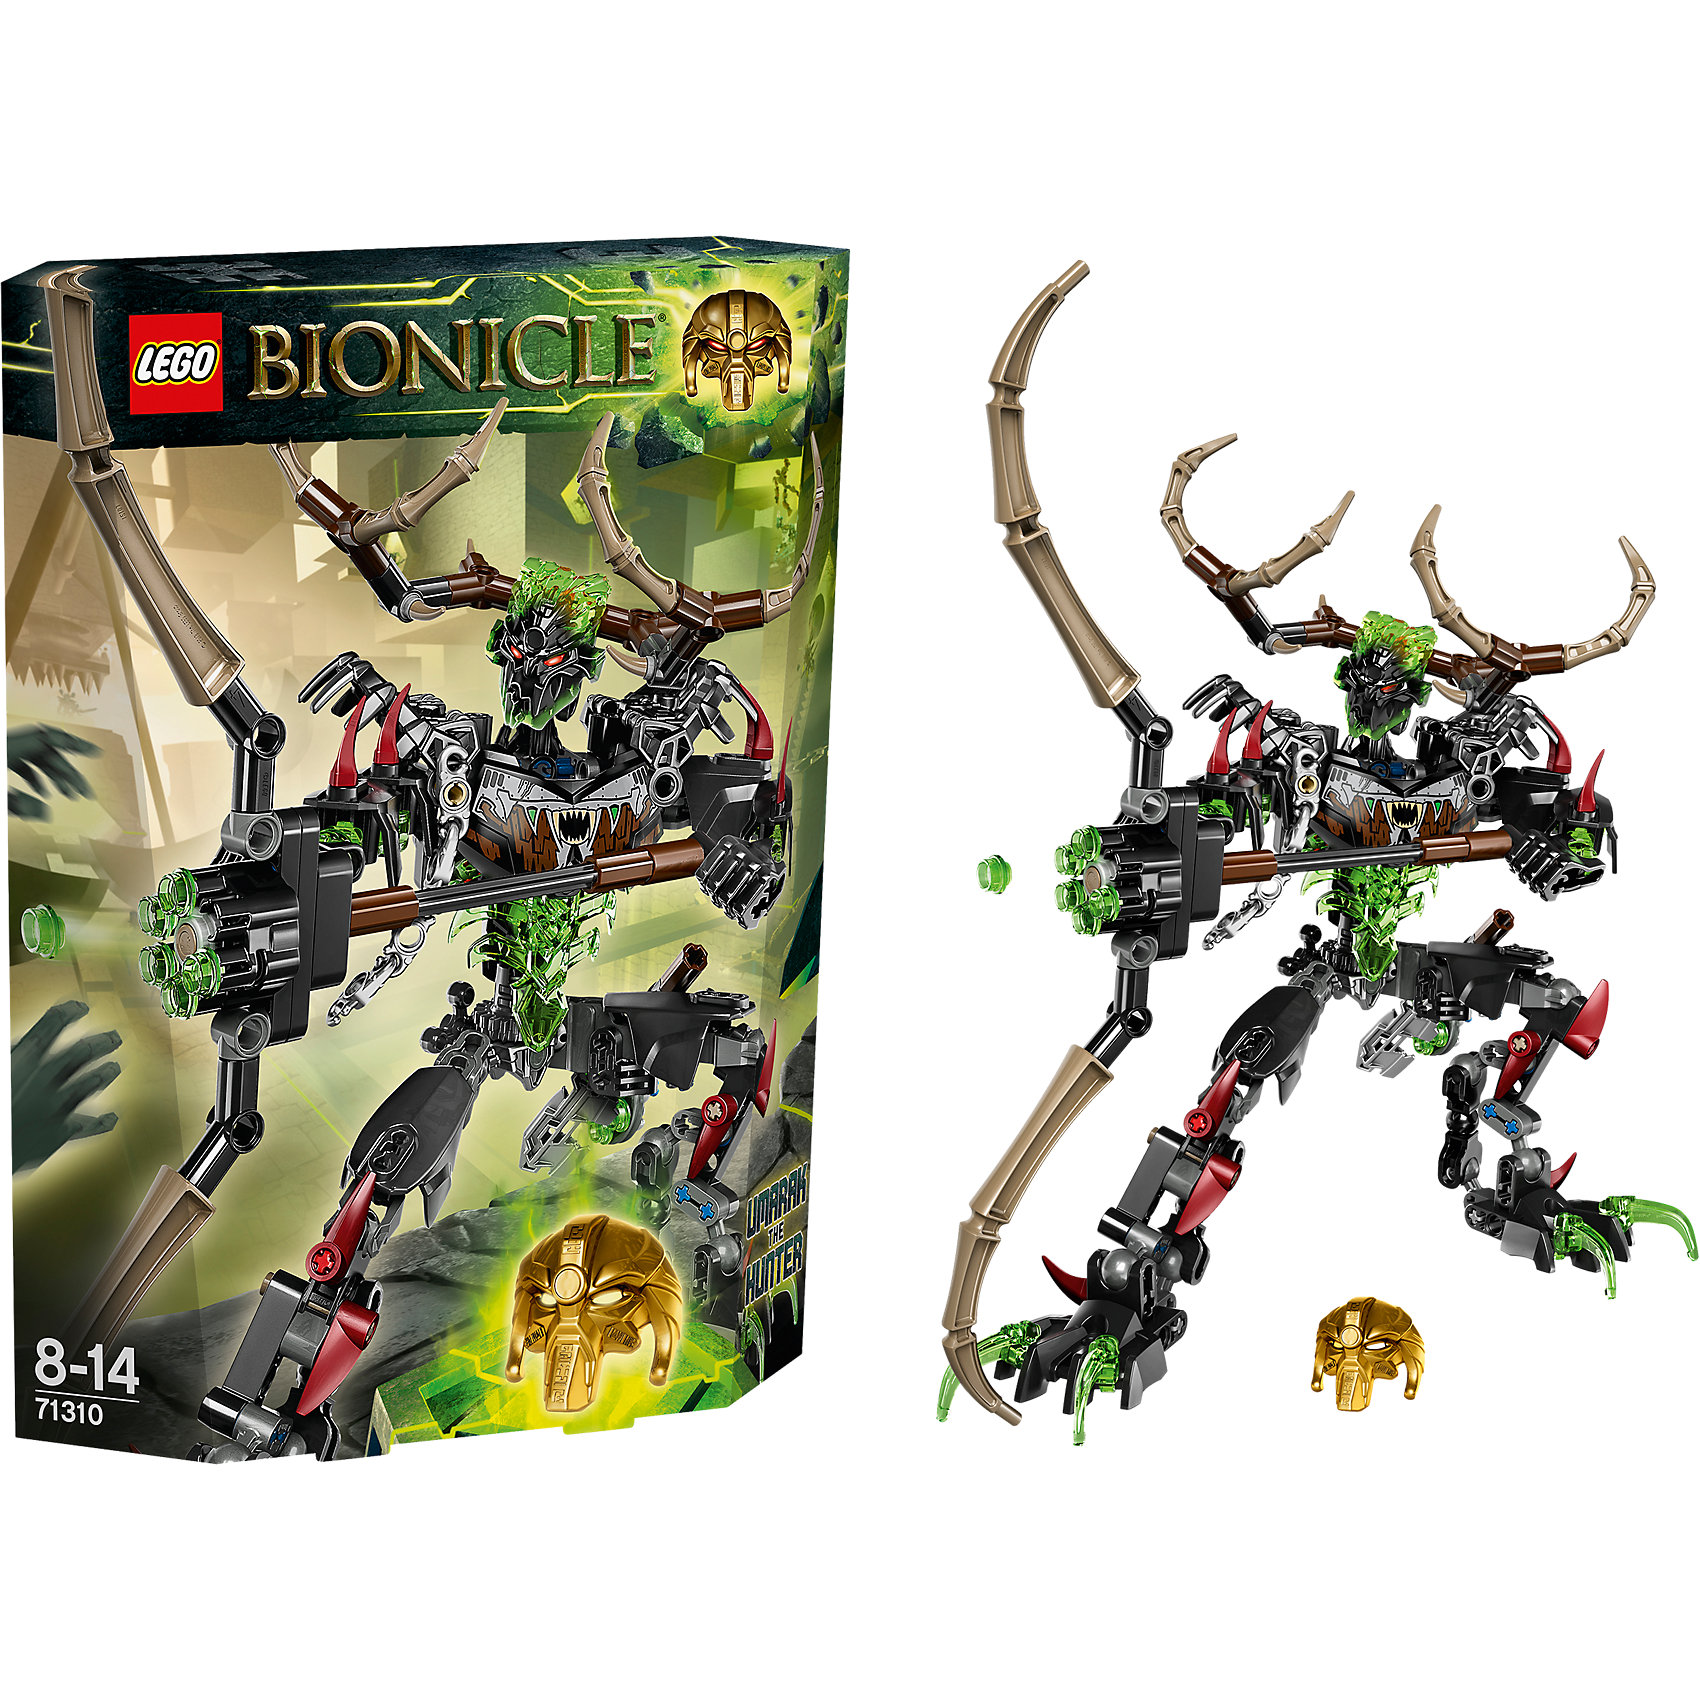 LEGO LEGO BIONICLE 71310: Охотник Умарак bionicle максилос и спинакс